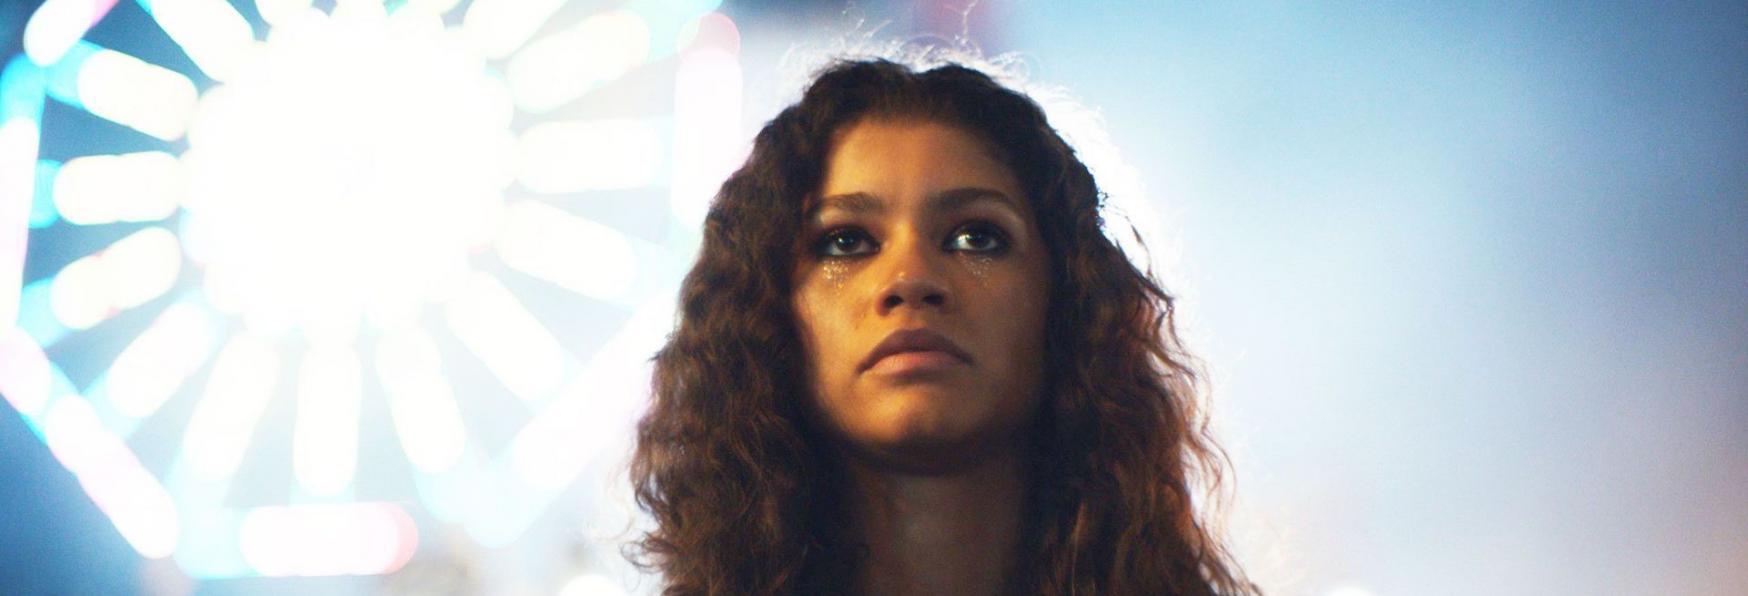 Euphoria 2: un Episodio Speciale? Le Parole della Star Zendaya